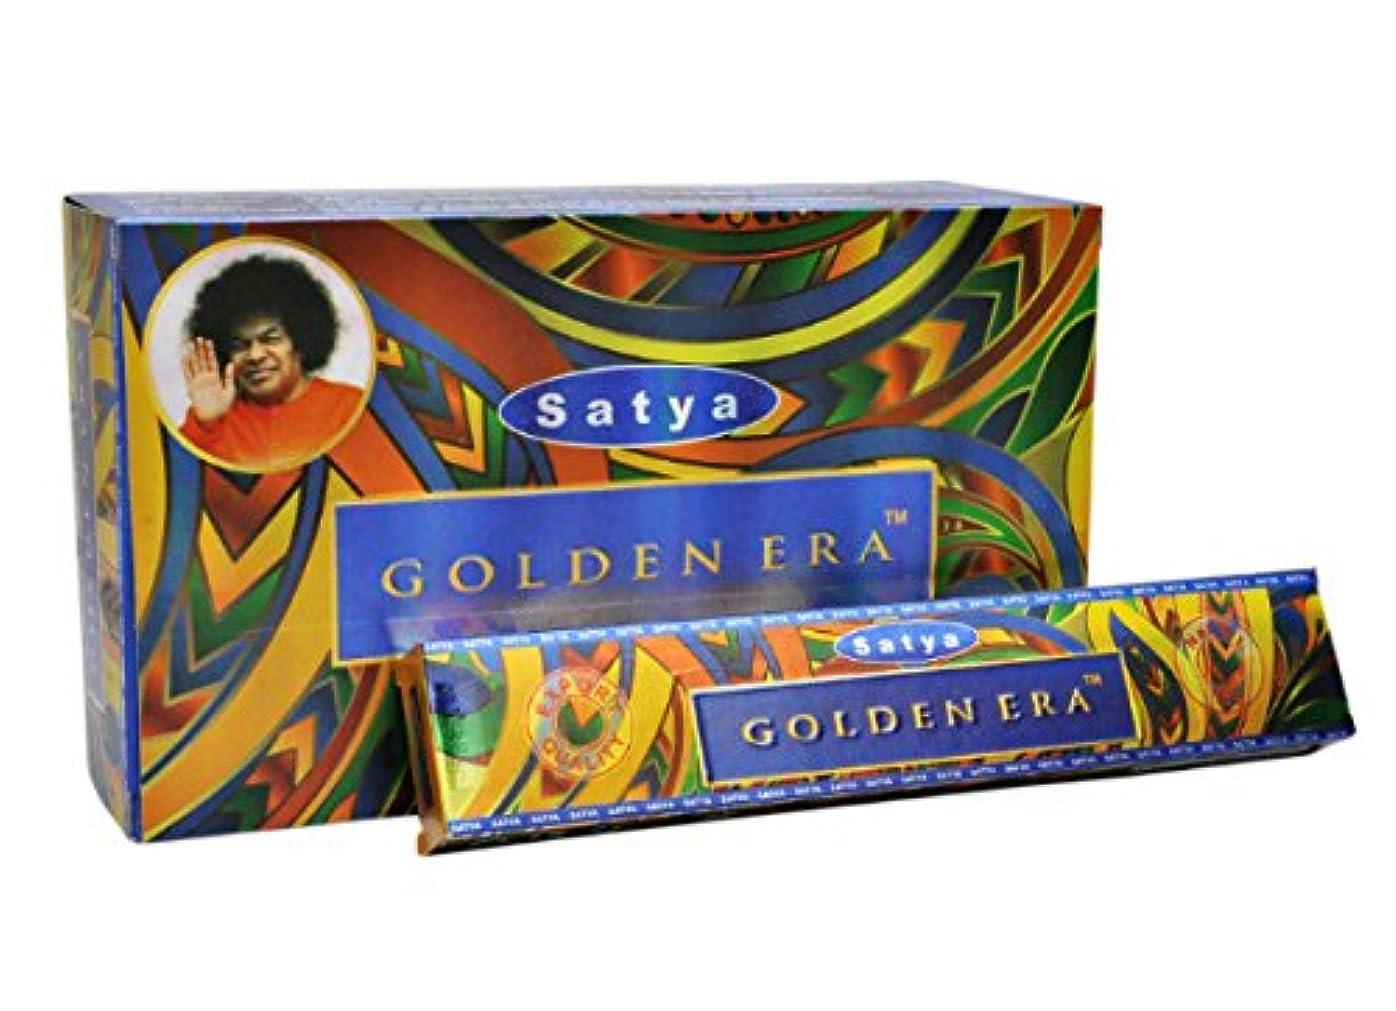 Satya Golden Era お香スティック 180gフルボックス